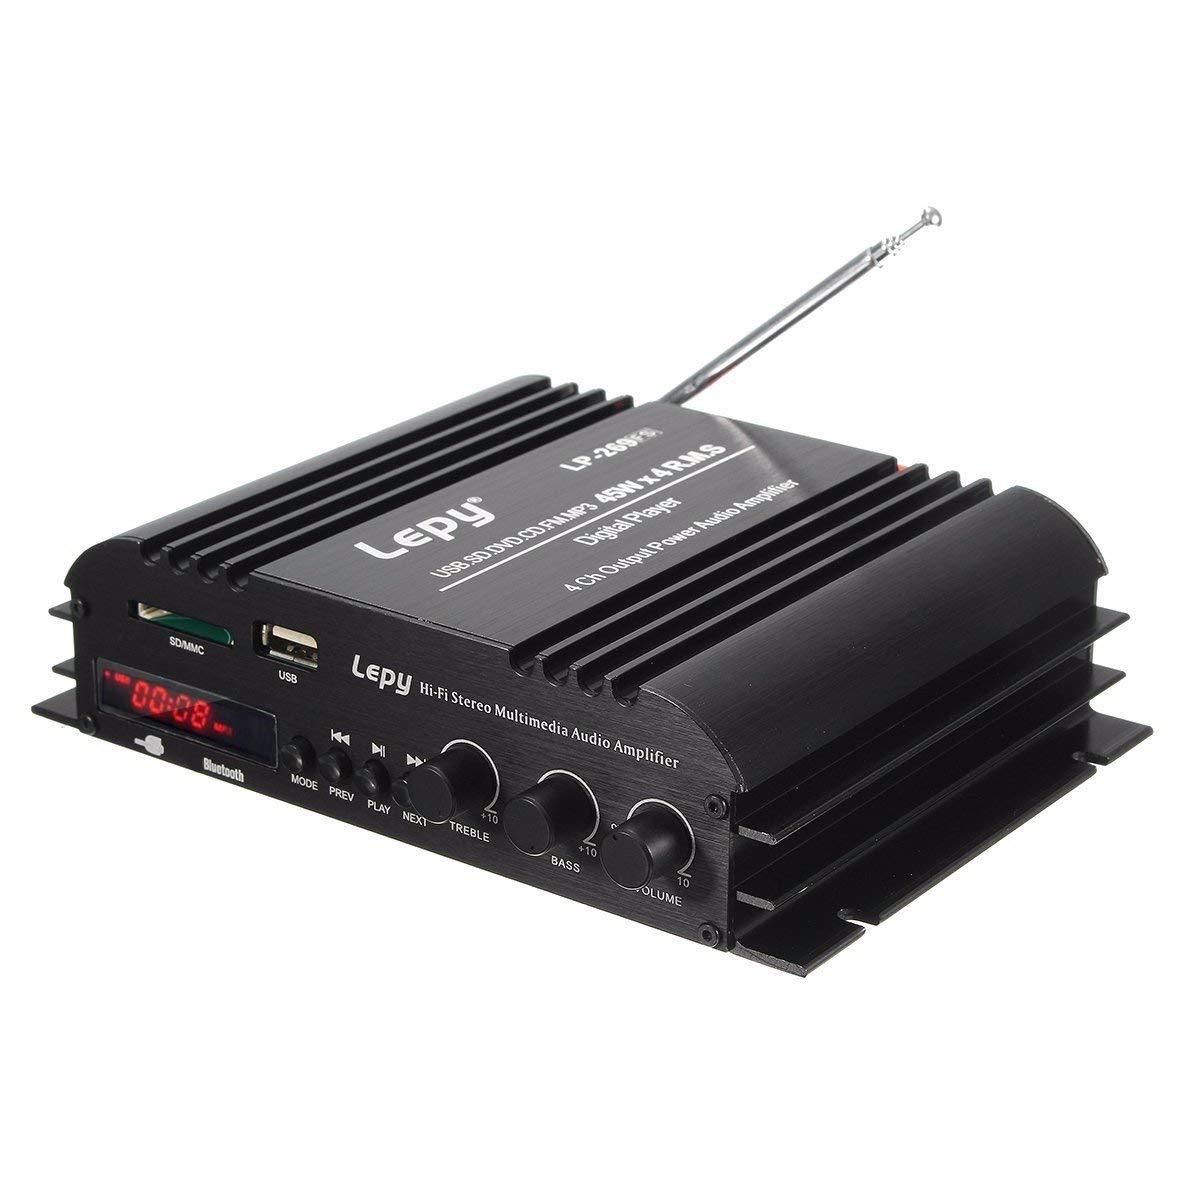 Cheap 6 Channel Car Audio Amplifier Find Wiring Kit 1600w 4 Digital Bridgeable Pro Don T Get Quotations Lepy 269fs Hifi Stereo 4channel Wireless Bluetooth Mp3 Speaker 45w